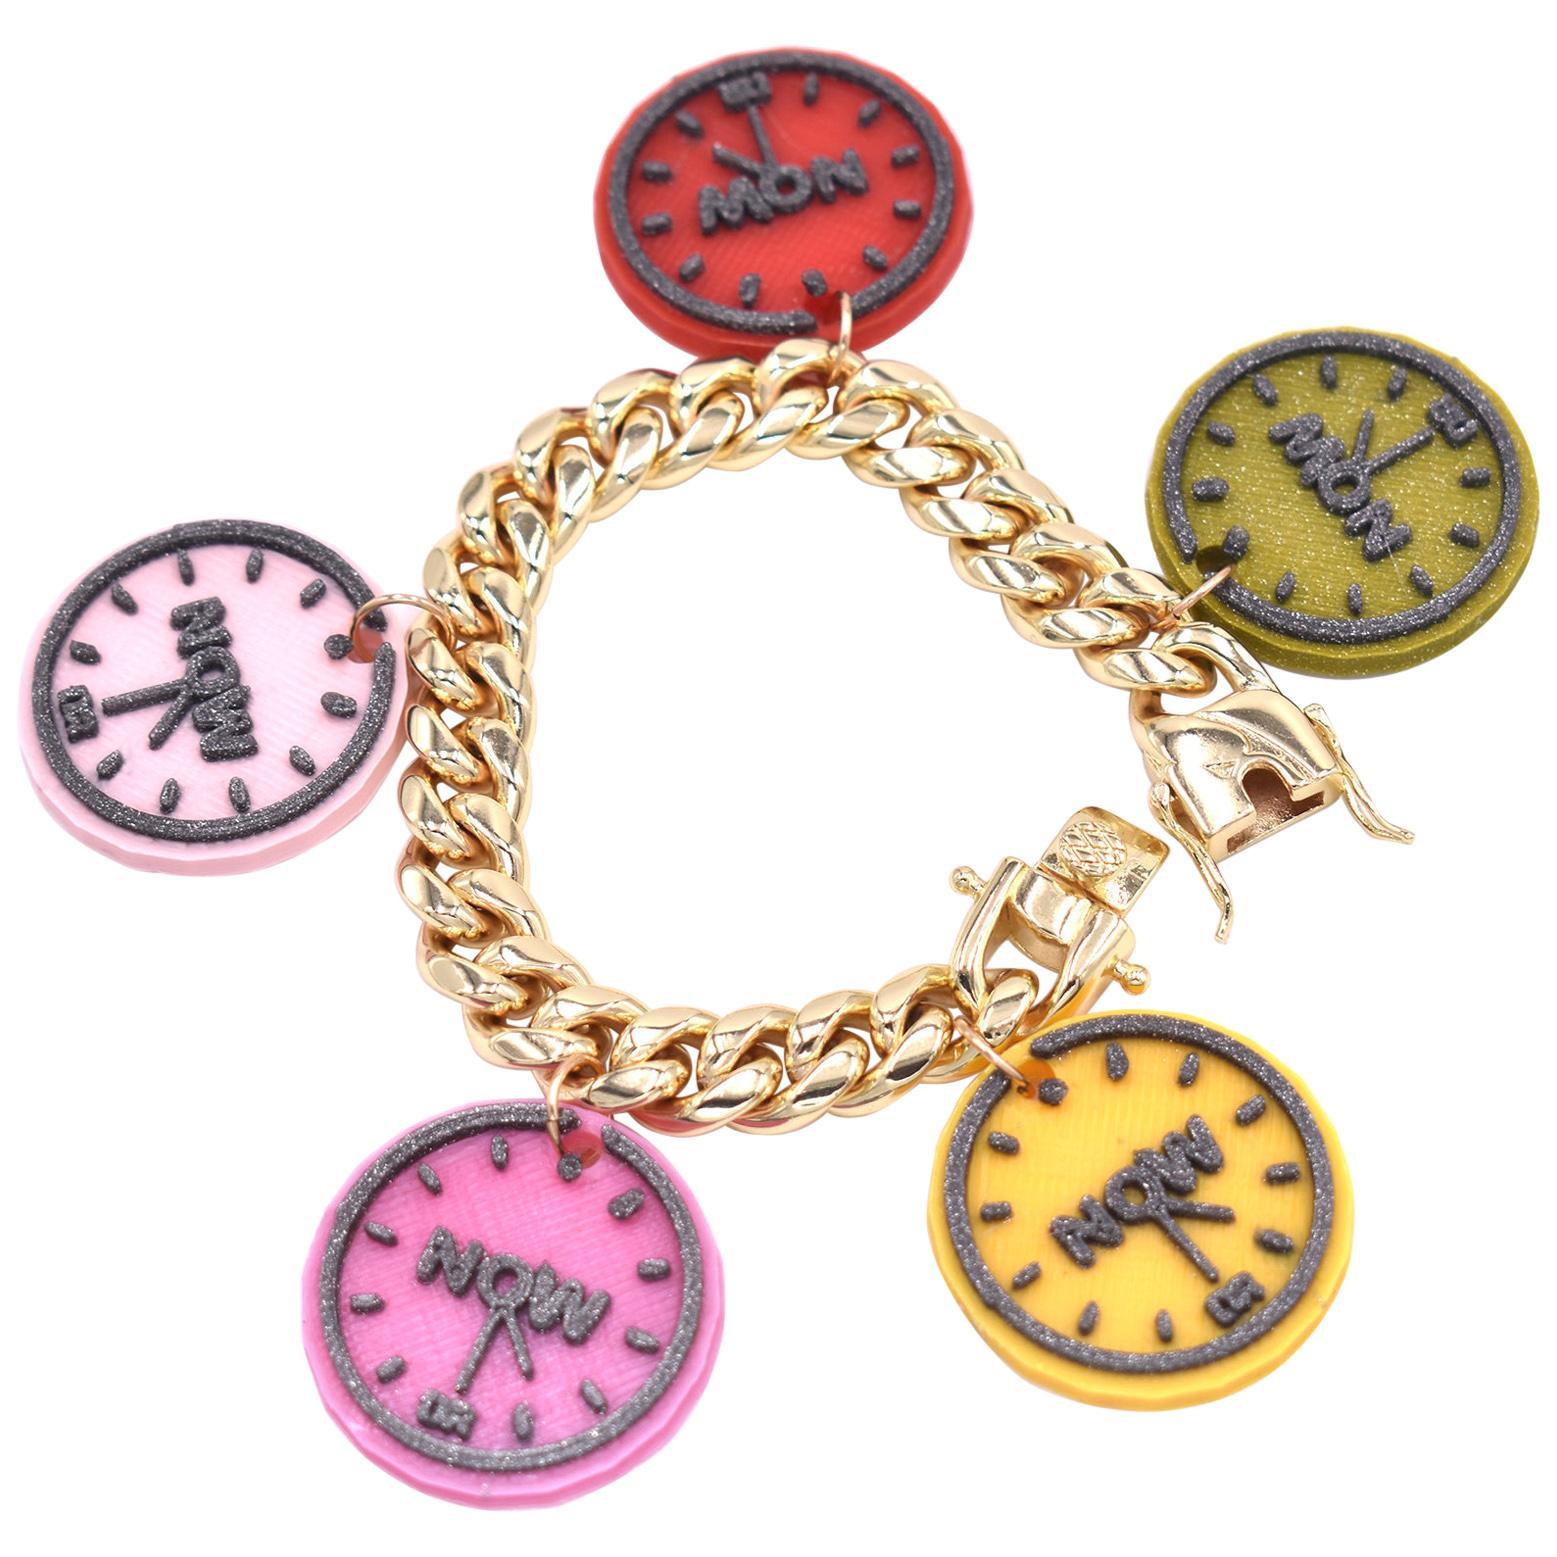 3d Printed NOW Watch Charm Bracelet